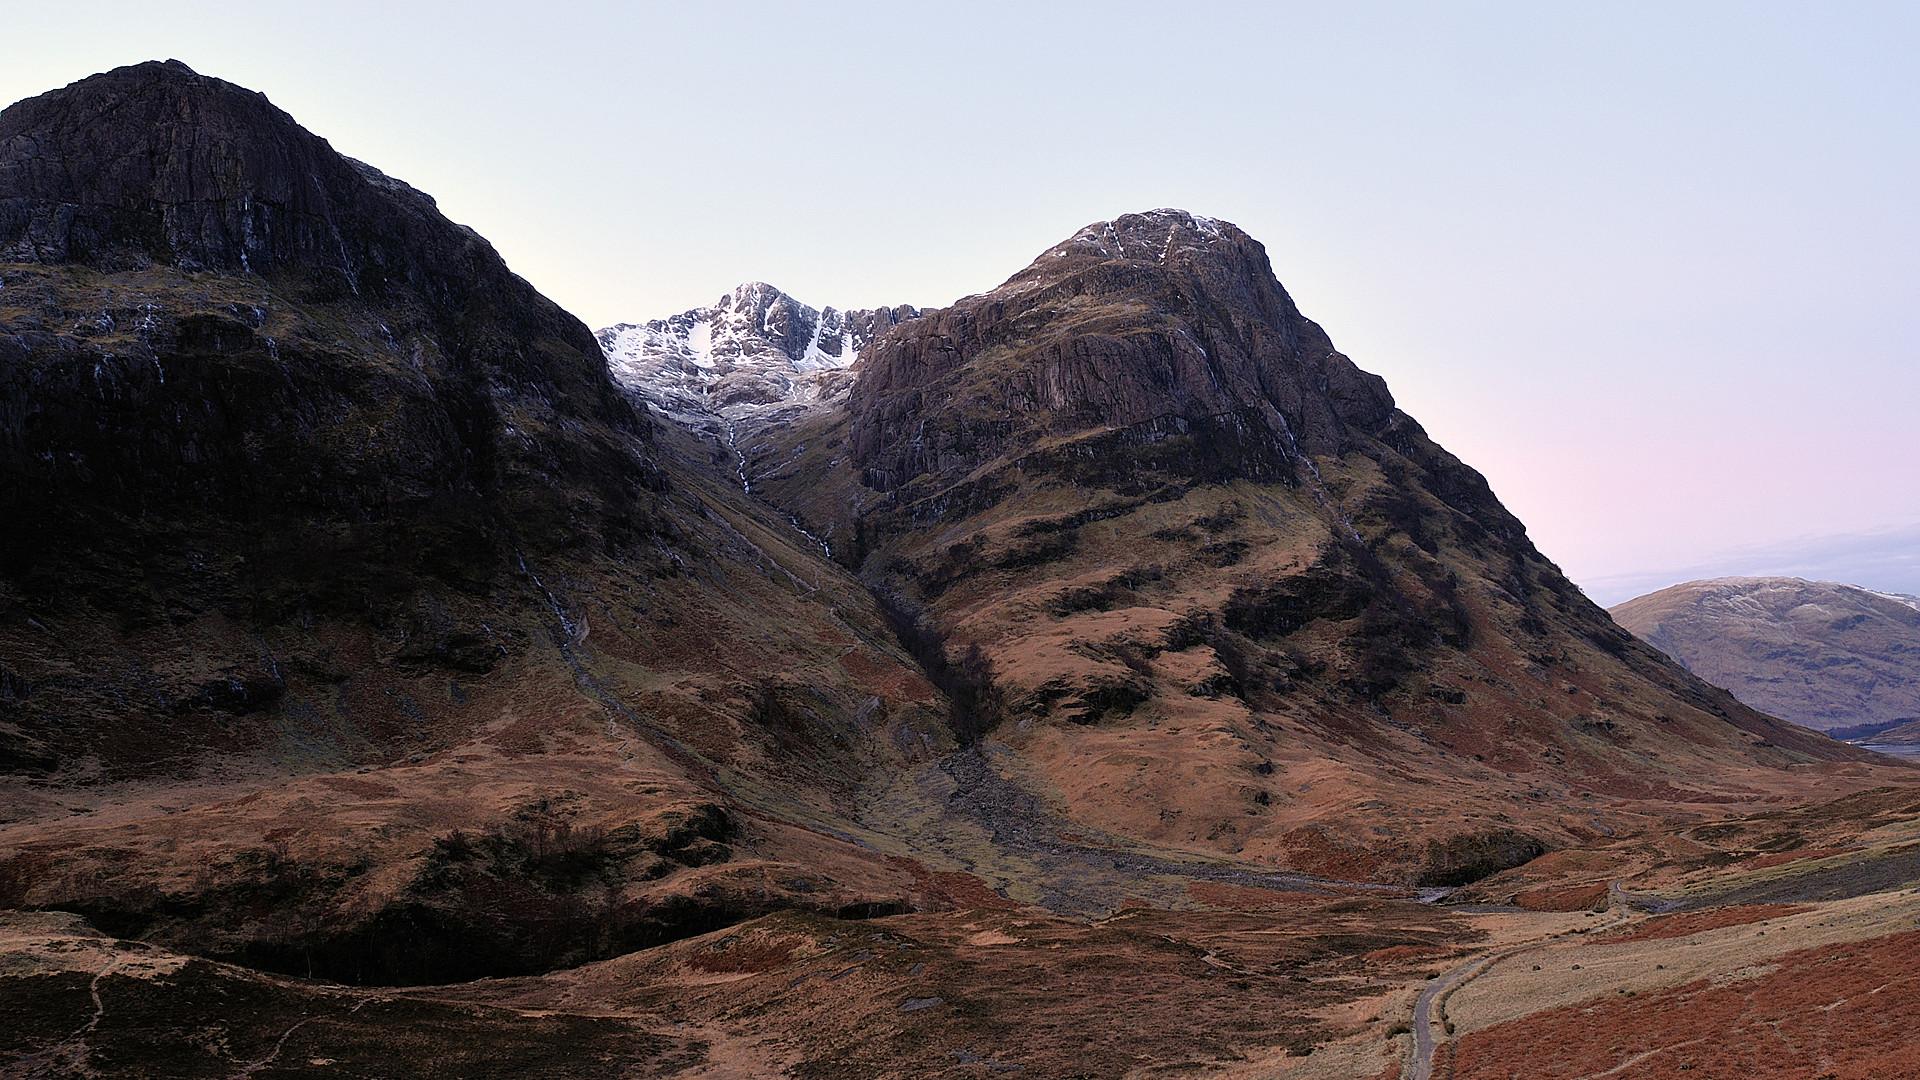 Cool Mountain HD Wallpaper – Mountains Widescreen HD Wallpapers .